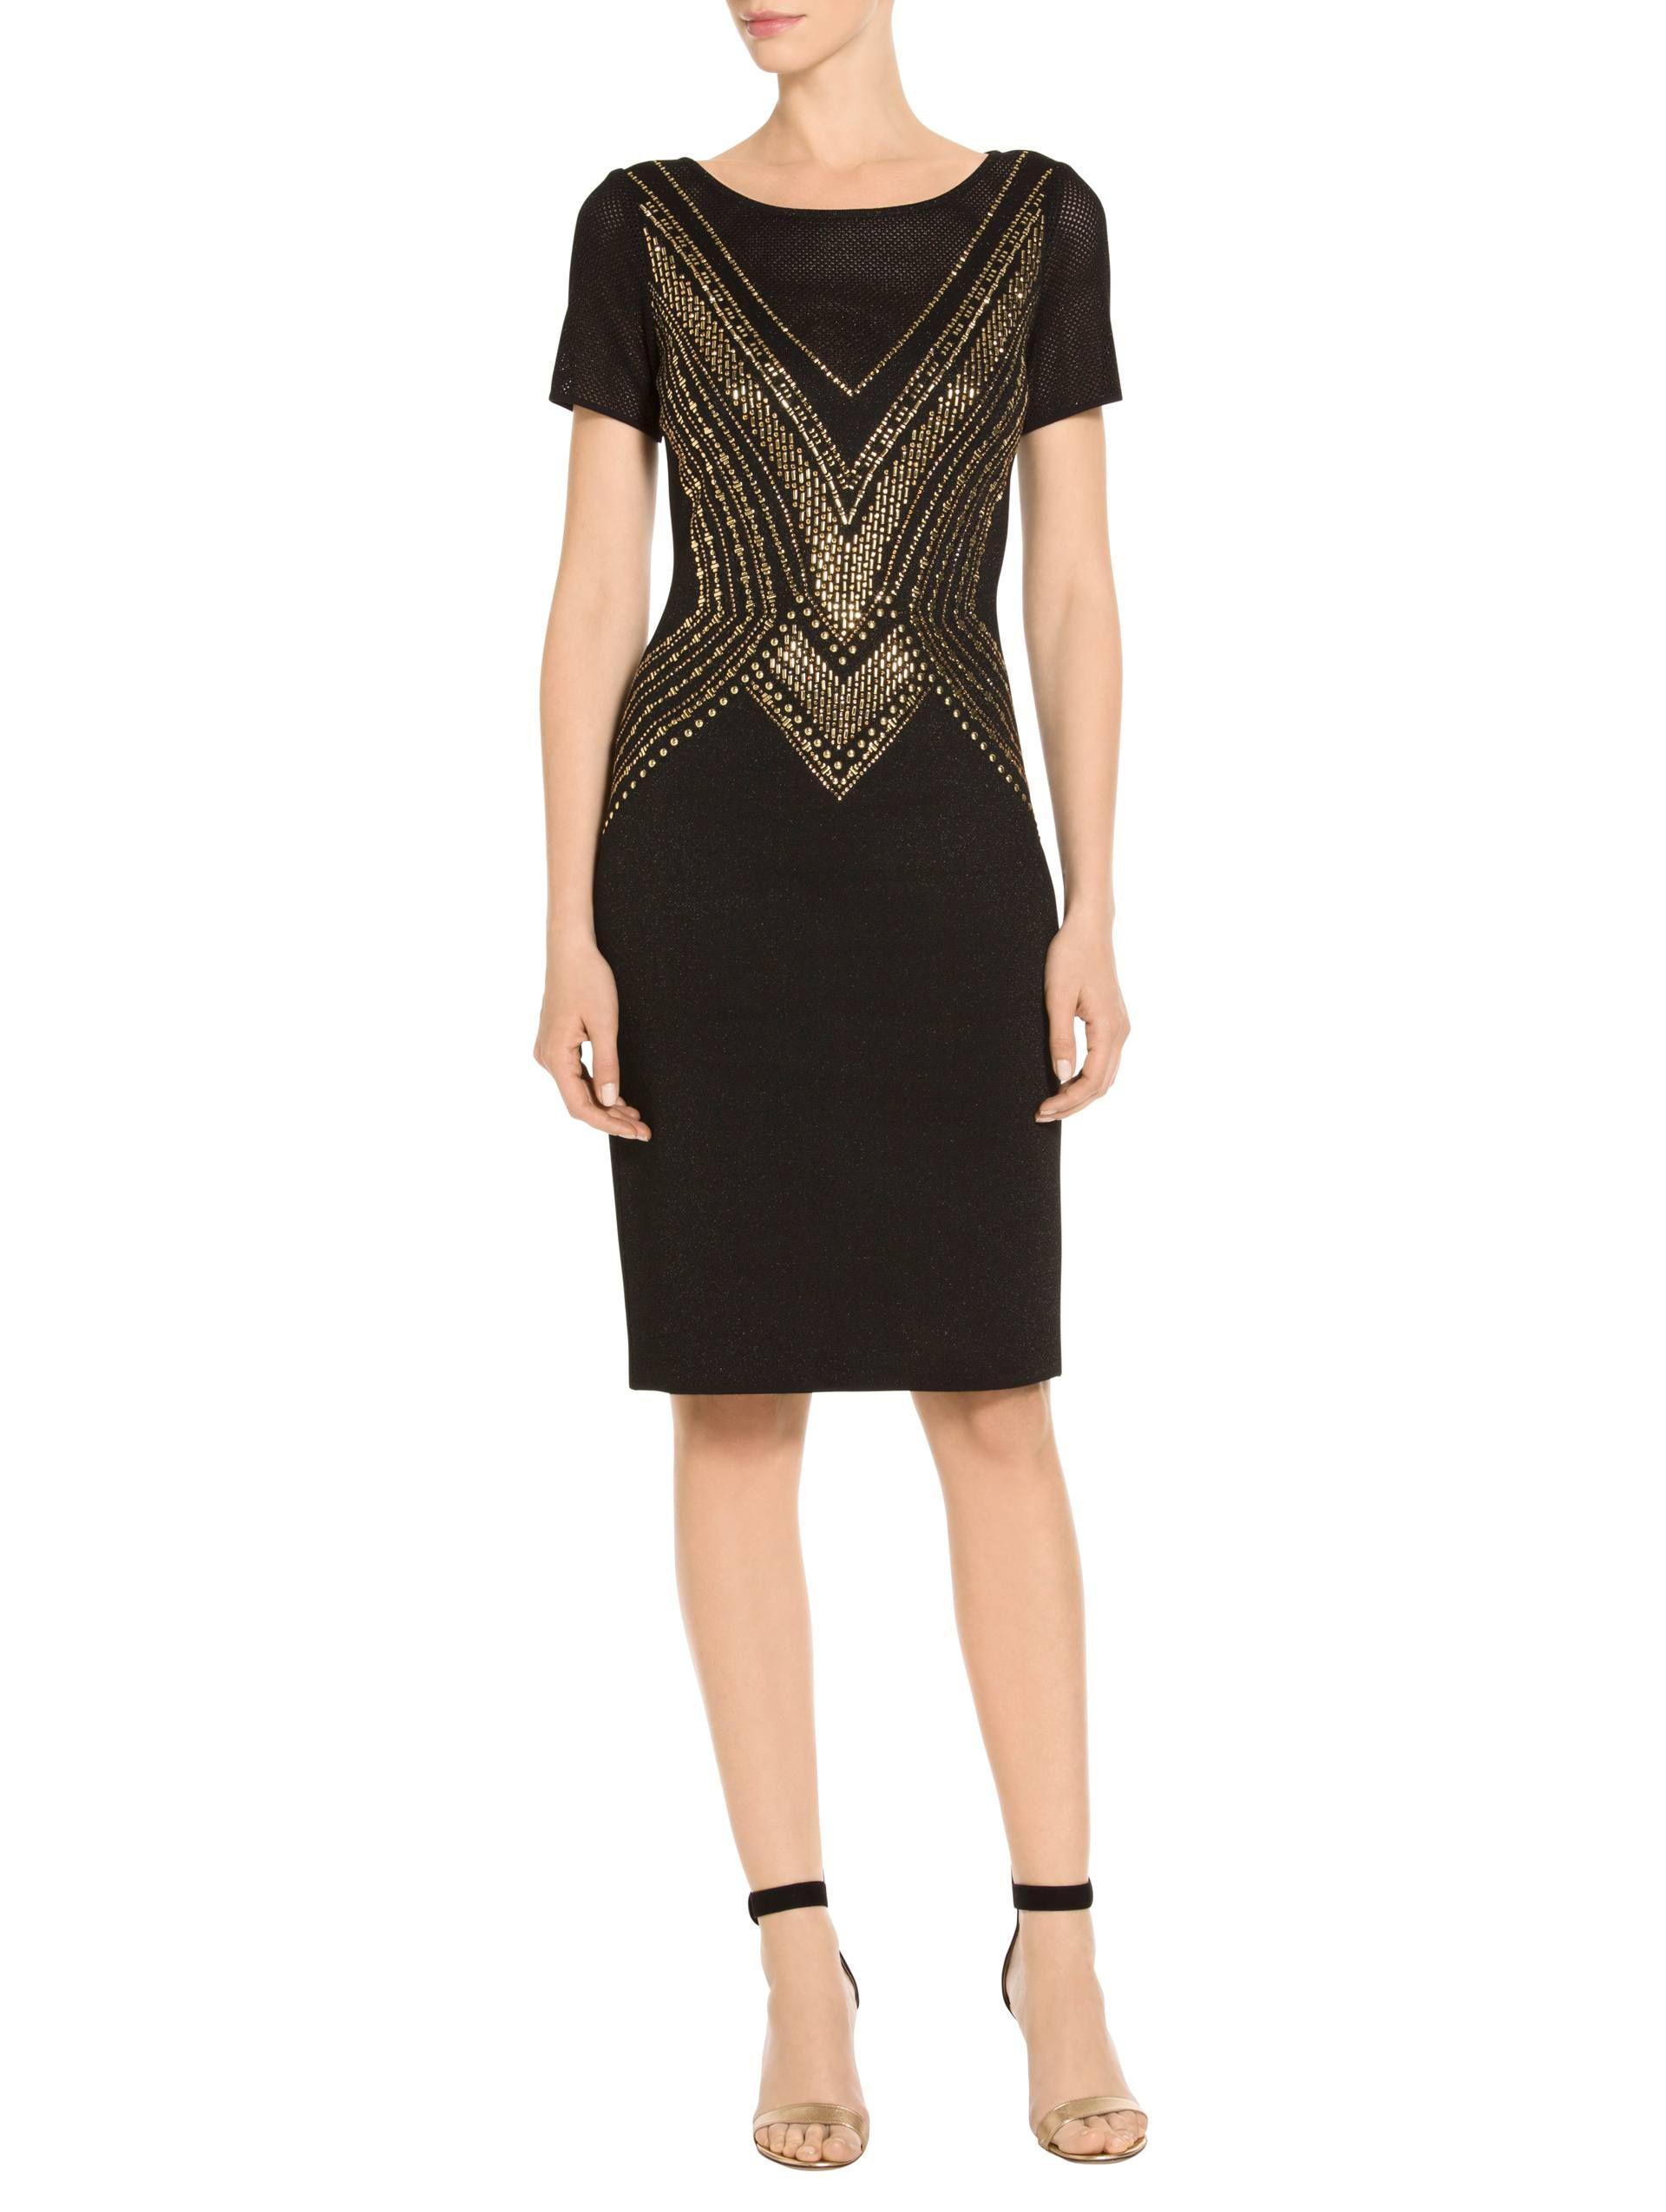 c36d7ac7cf59 Lyst - St. John Layered Pointelle Jacquard Knit Dress in Black ...